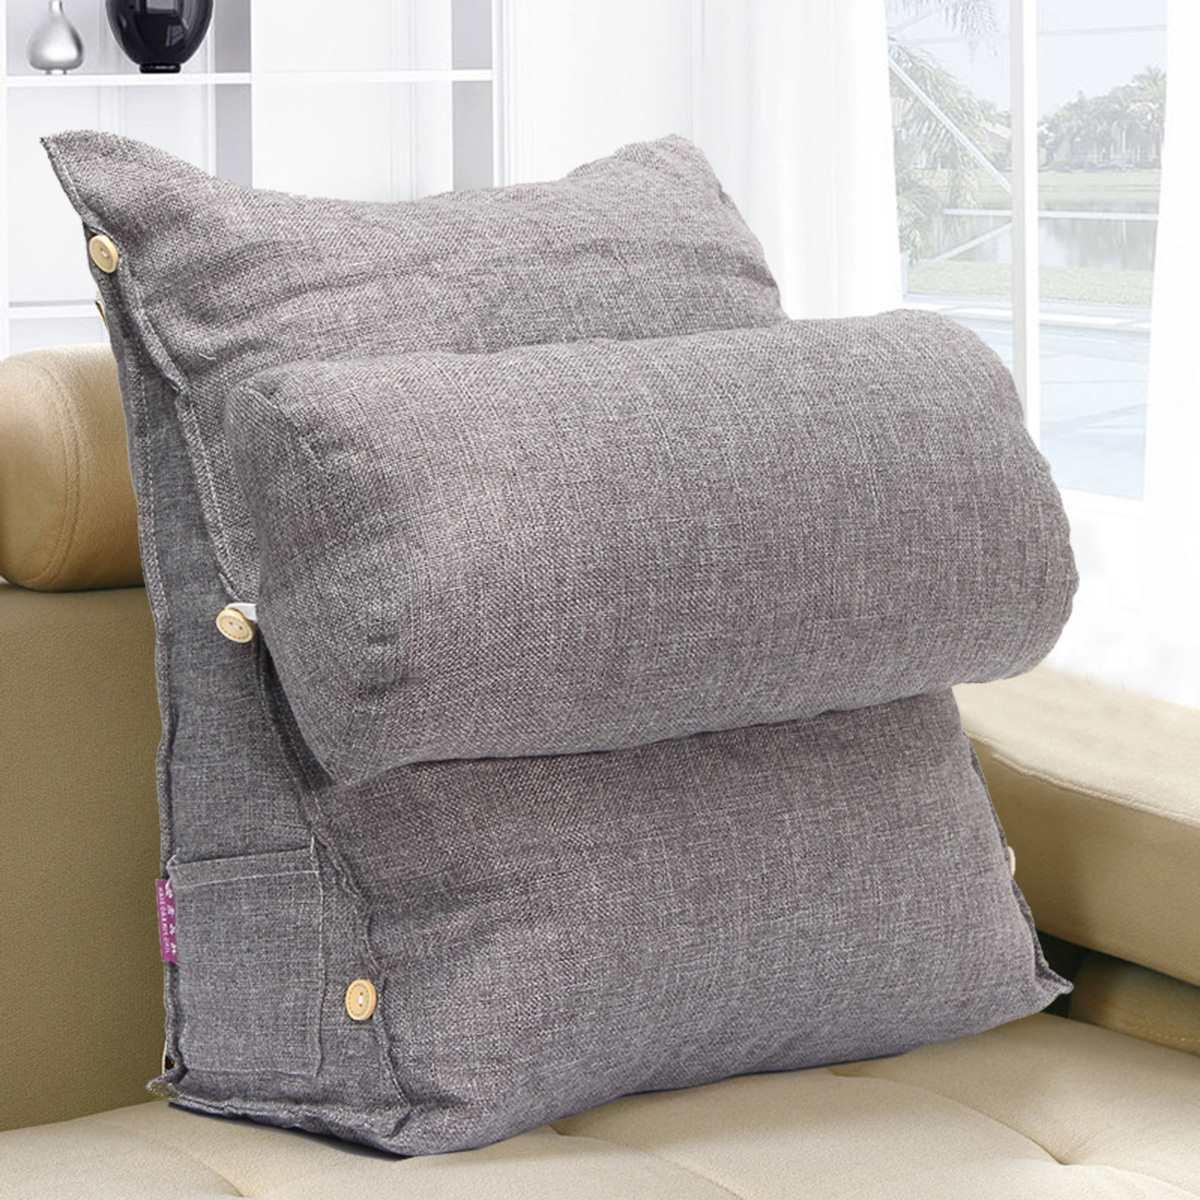 sofa cushion support reviews jardan nook modular gray adjustable bed pillow chair rest neck